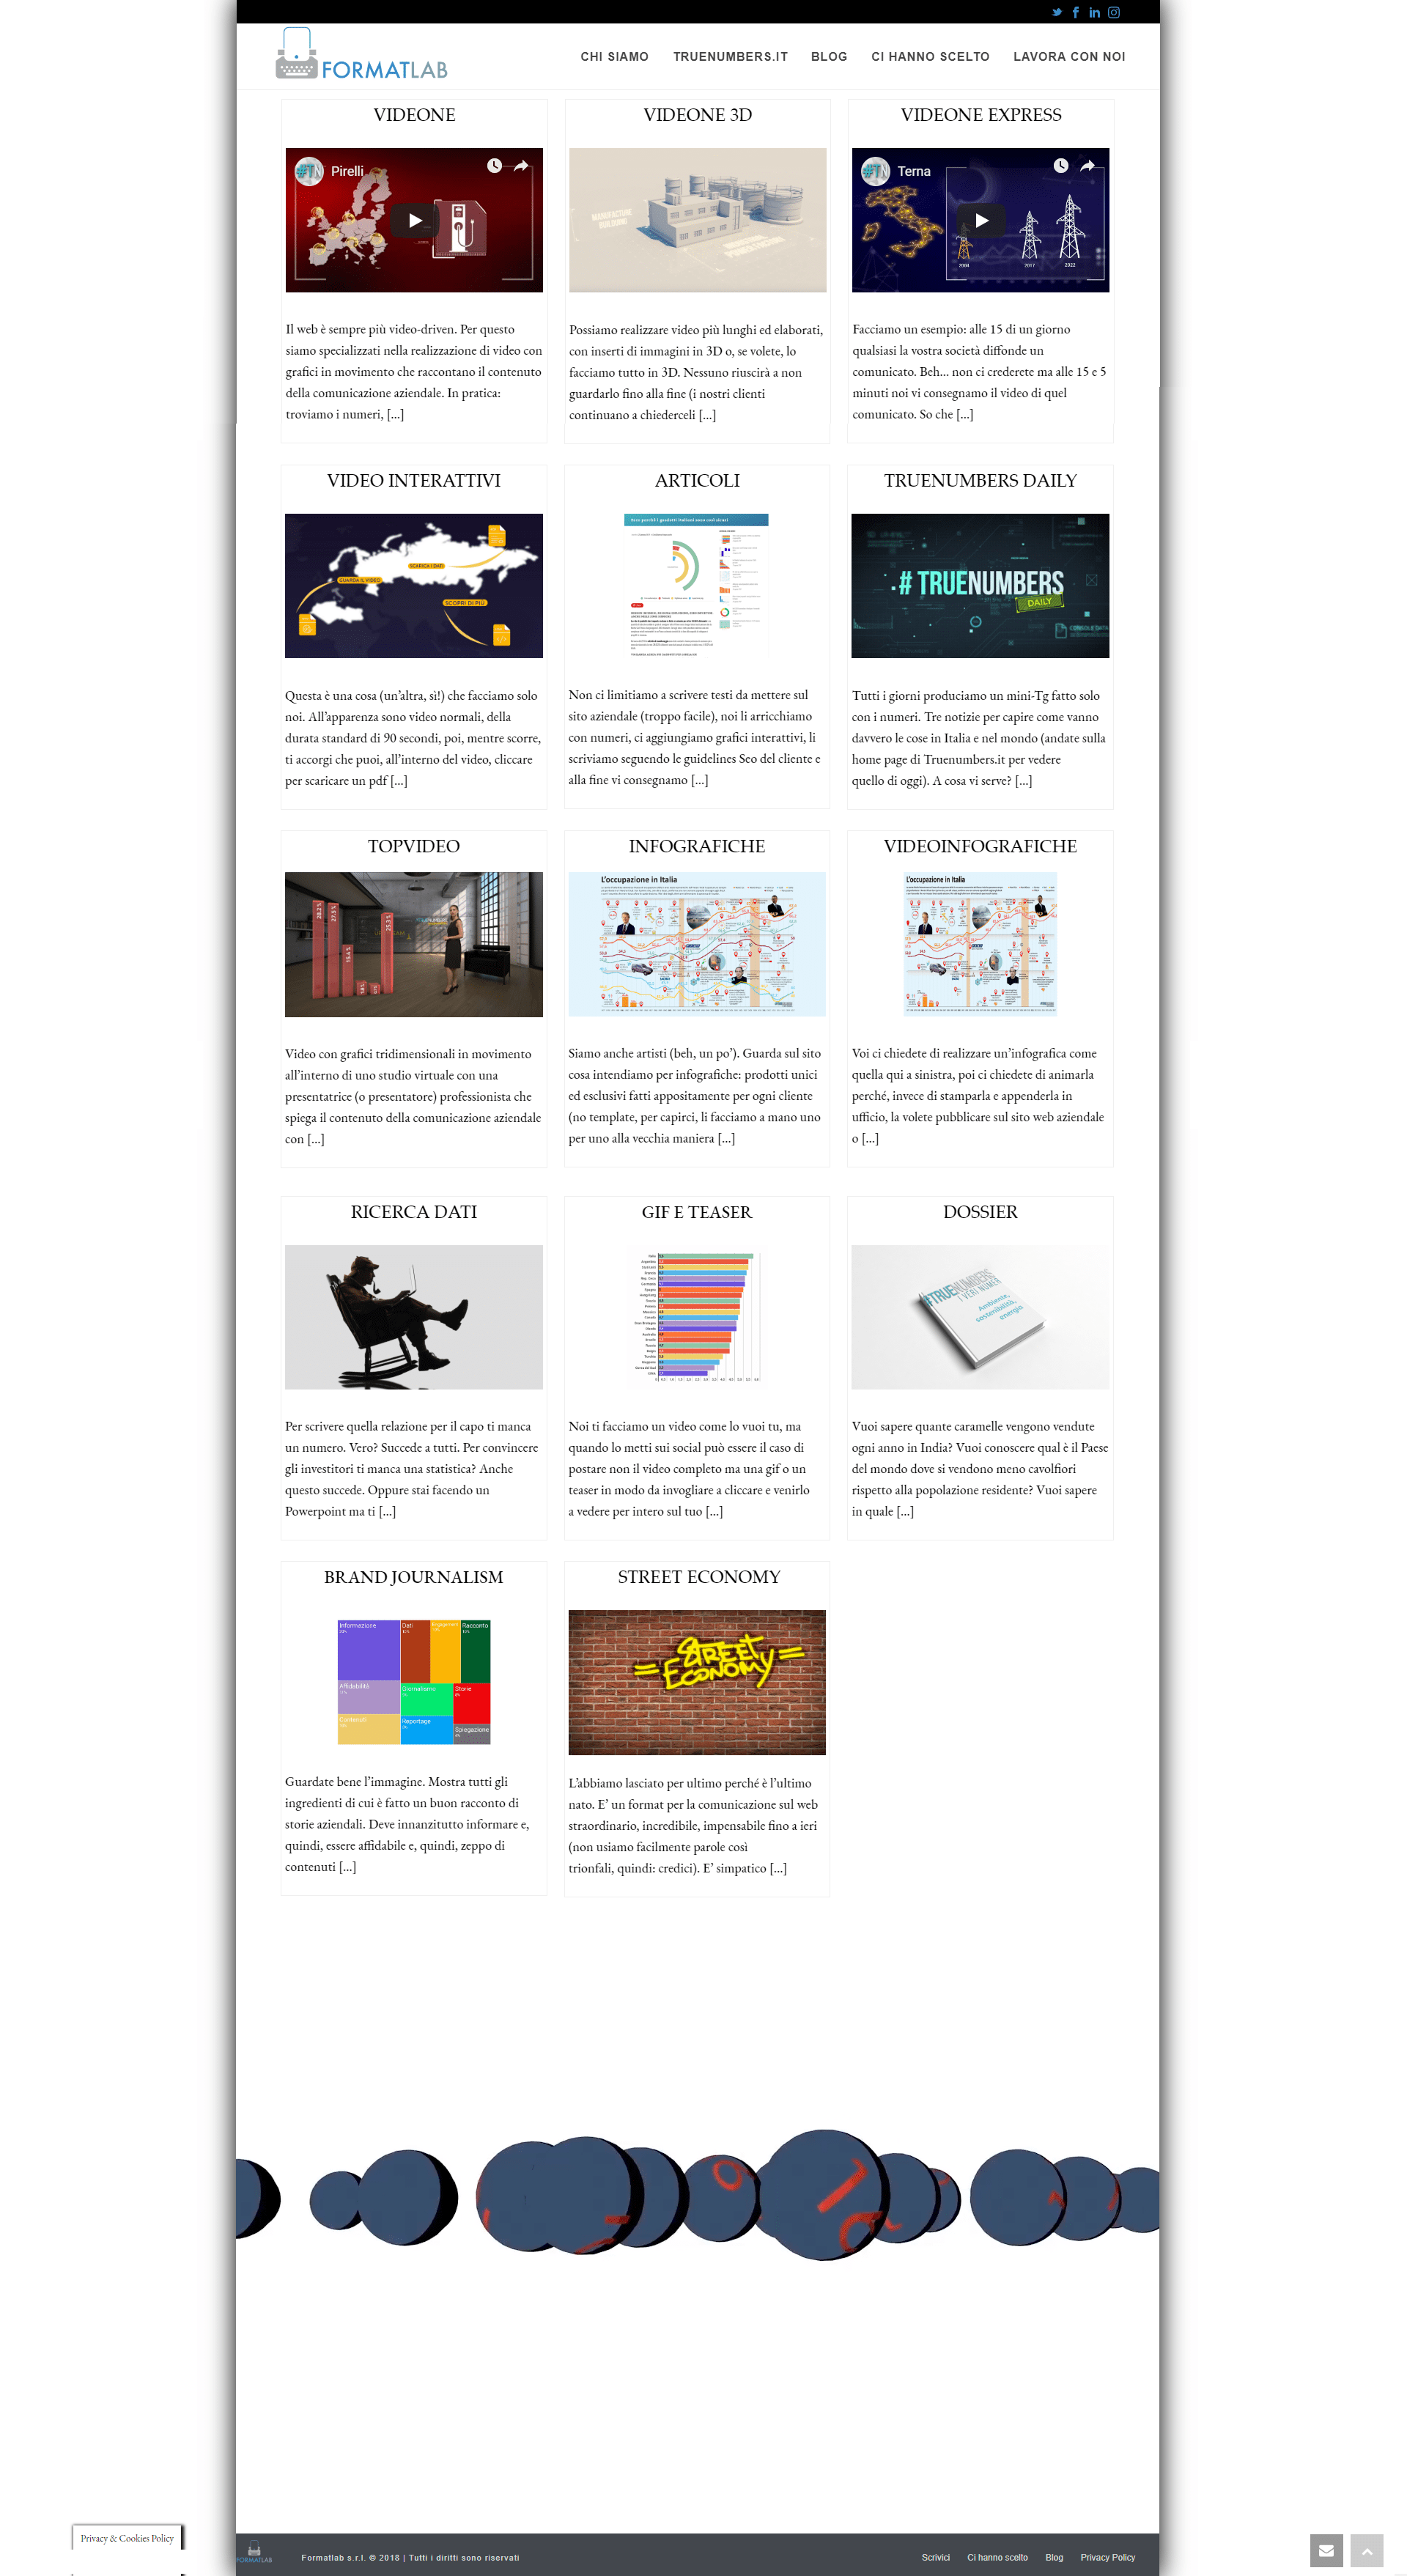 formatlab